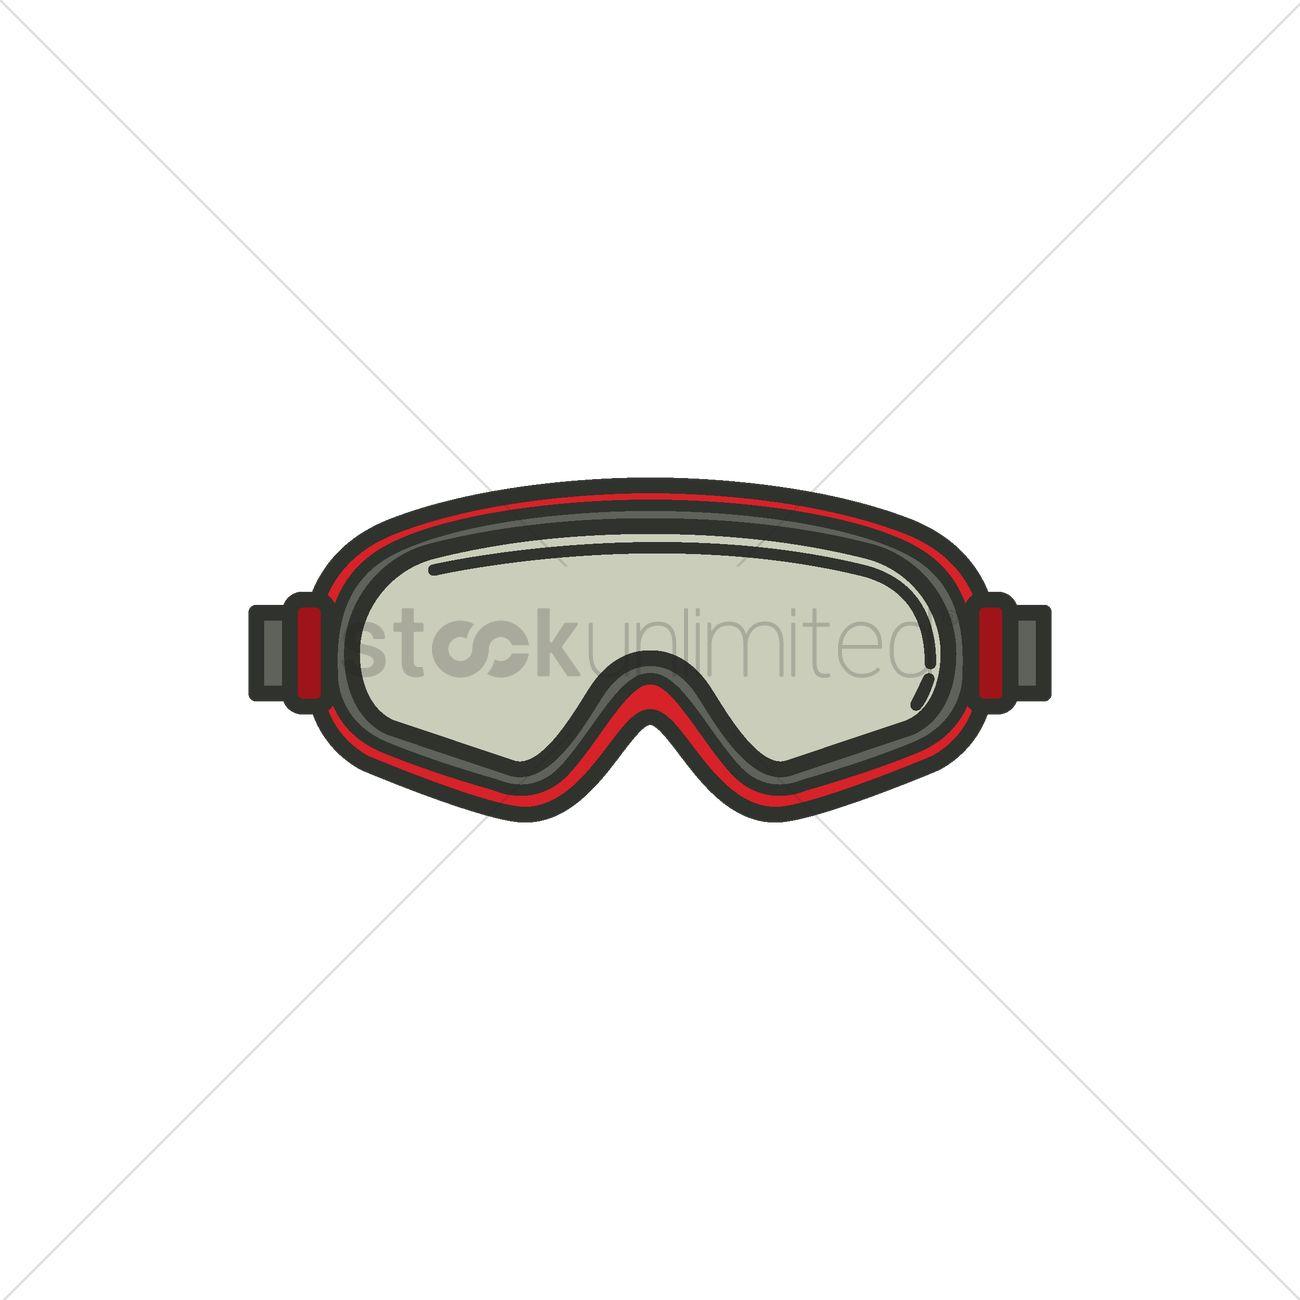 1300x1300 Ski Goggles Vector Image